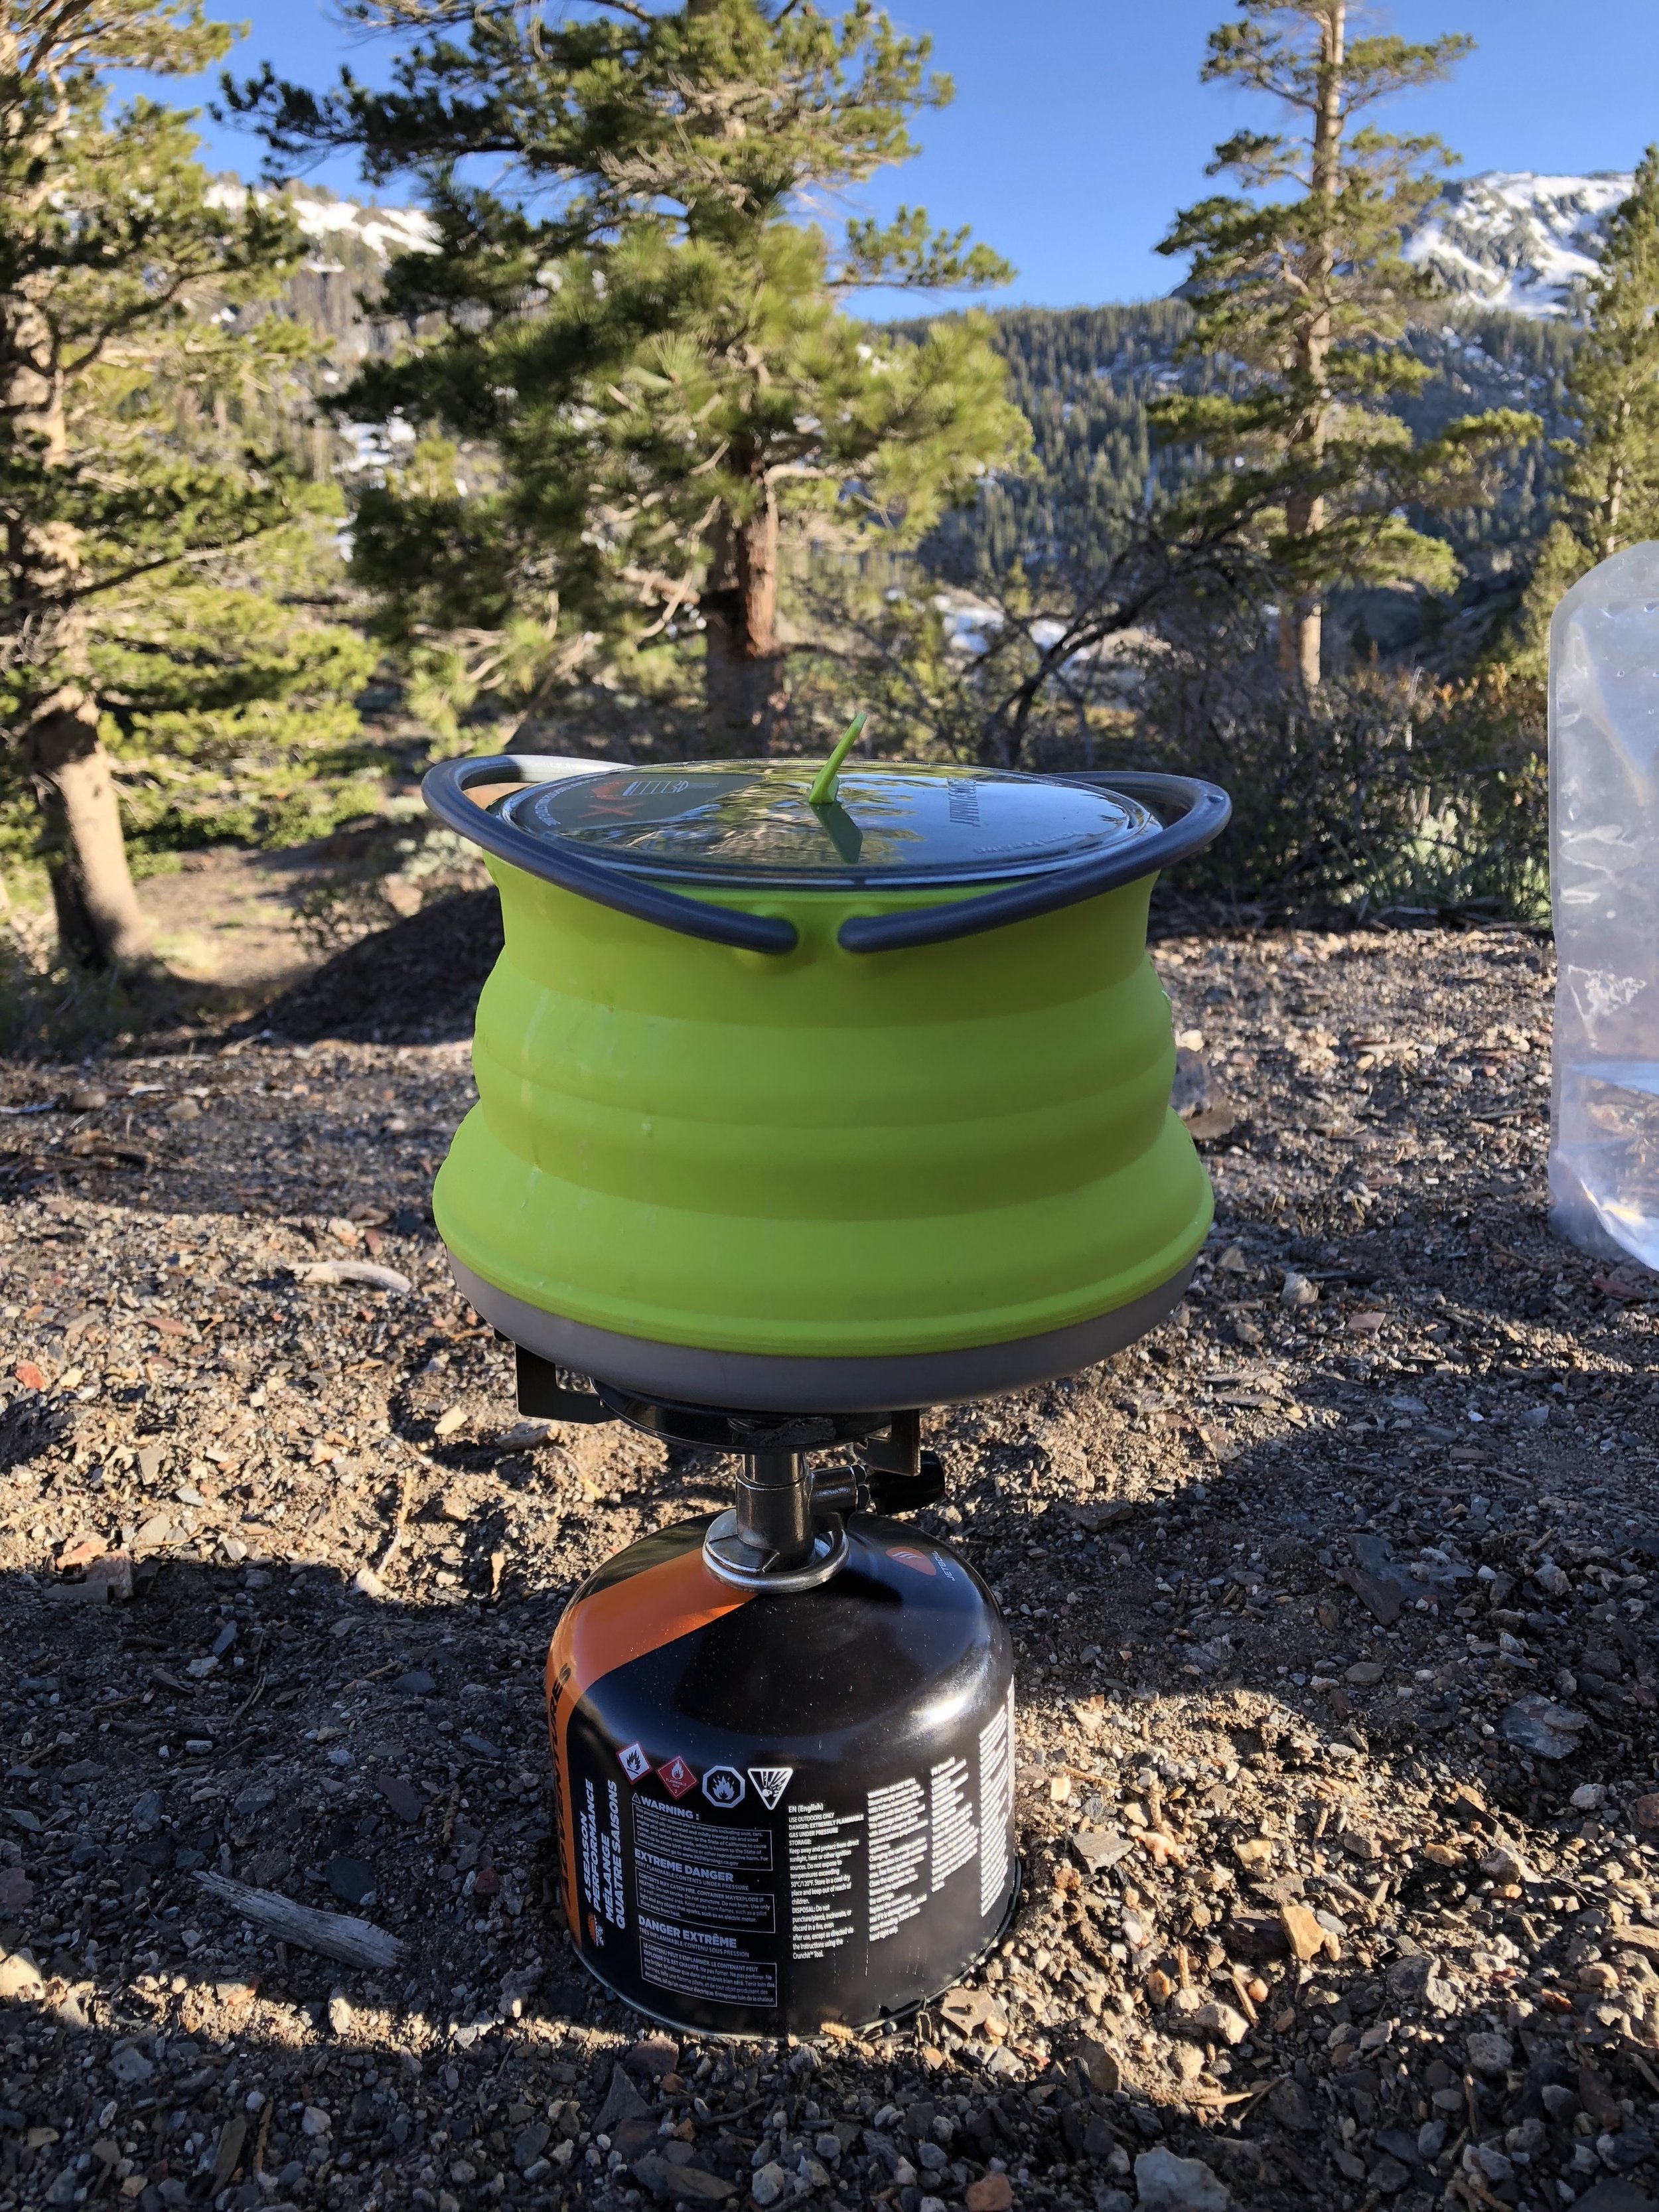 Sea to Summit pot, MSR Pocket Rocket stove and ISO propane stove